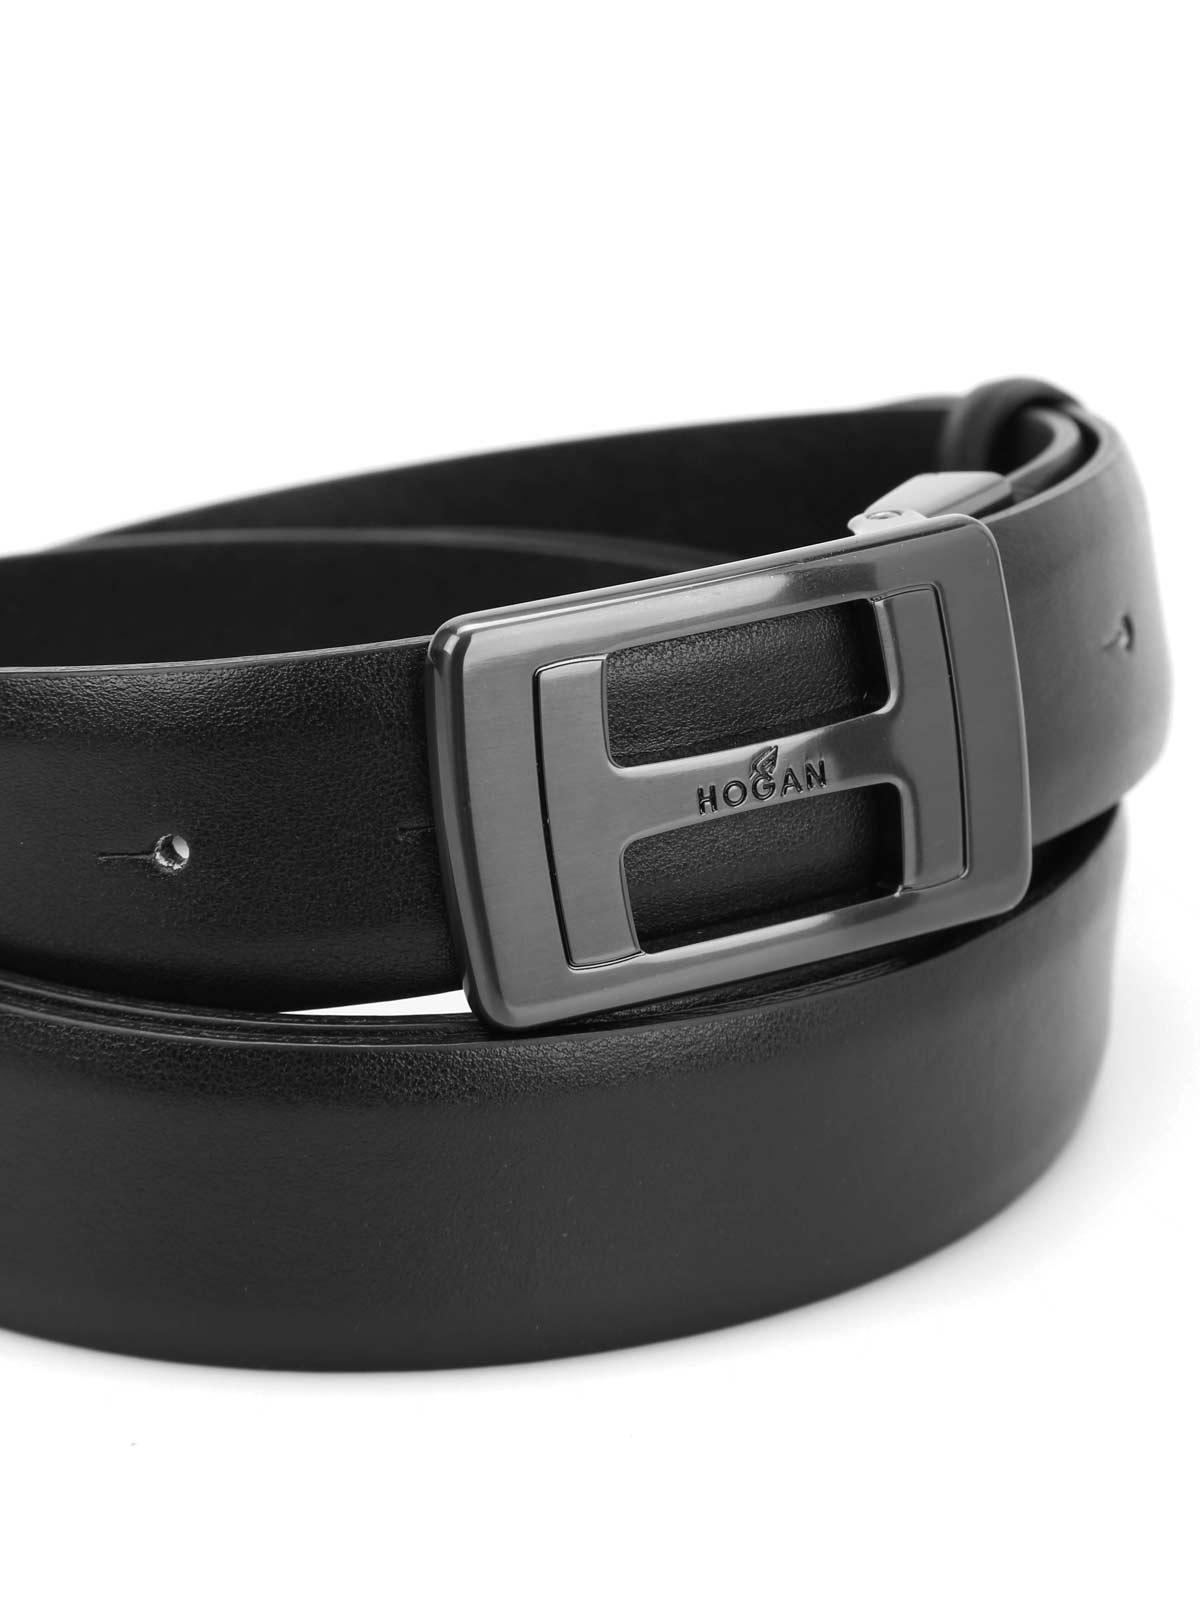 design di qualità e9e6a 80786 Hogan - Cintura Nuova H - cinture - KFMC0150102DURB999 ...